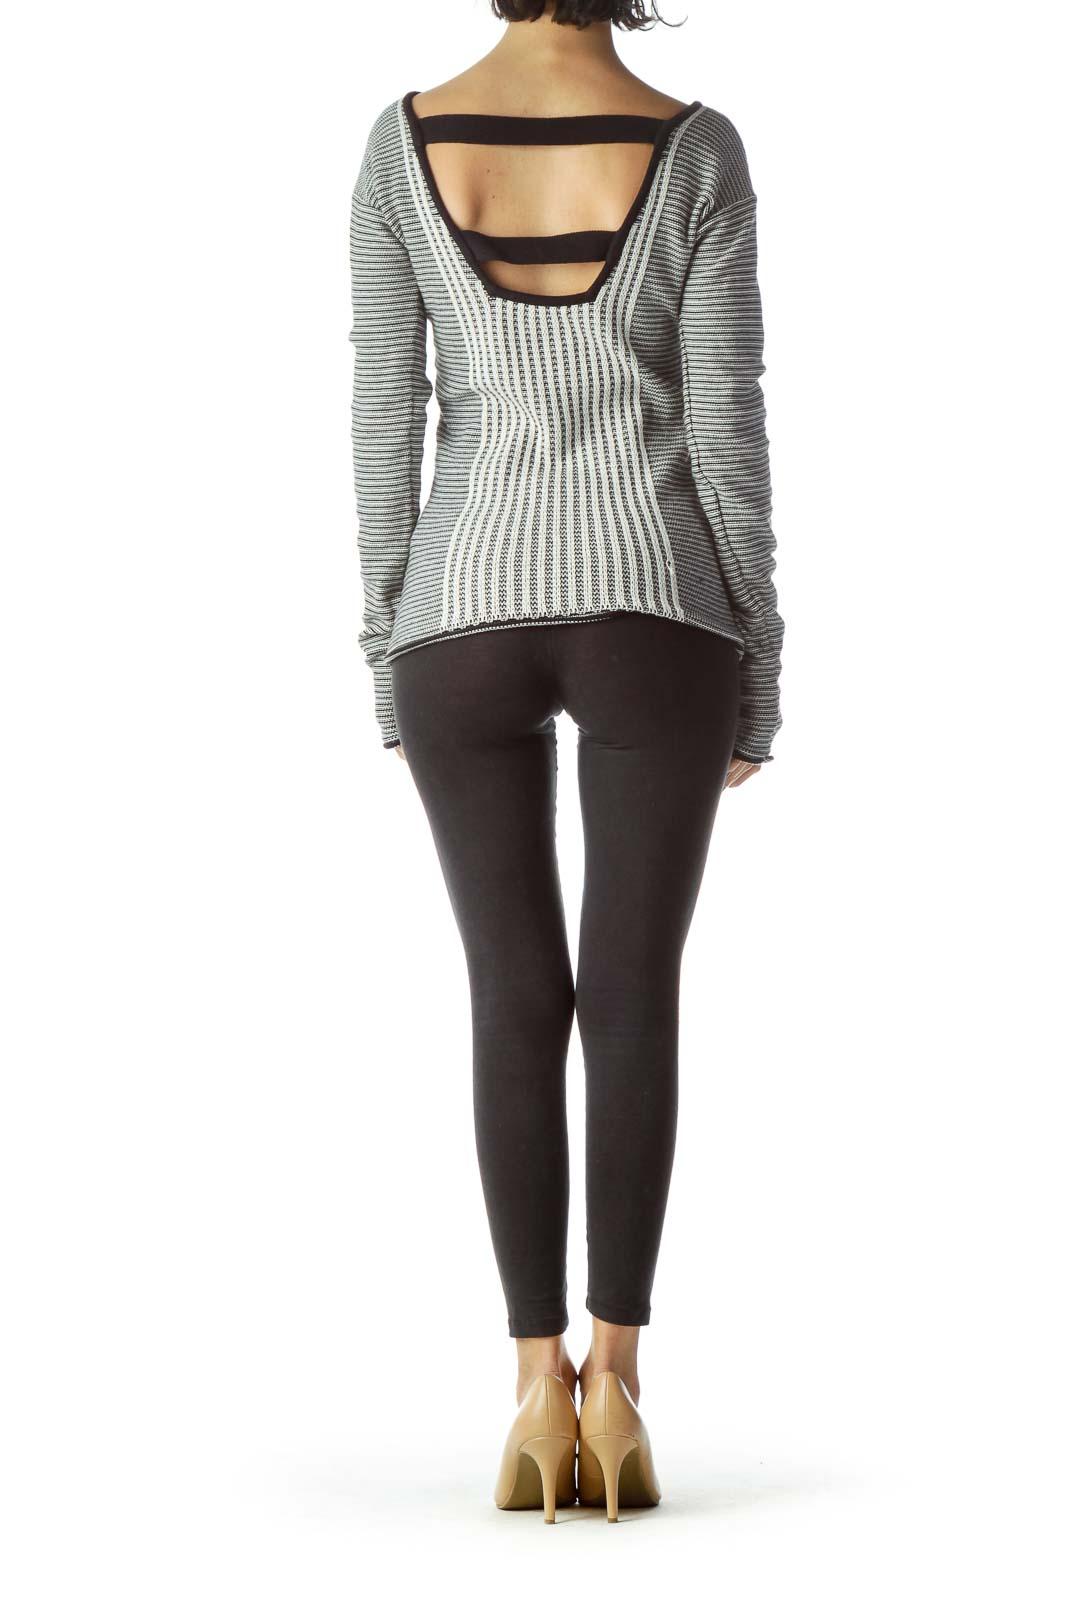 Black Cream Striped Textured Open Neck Knit Top